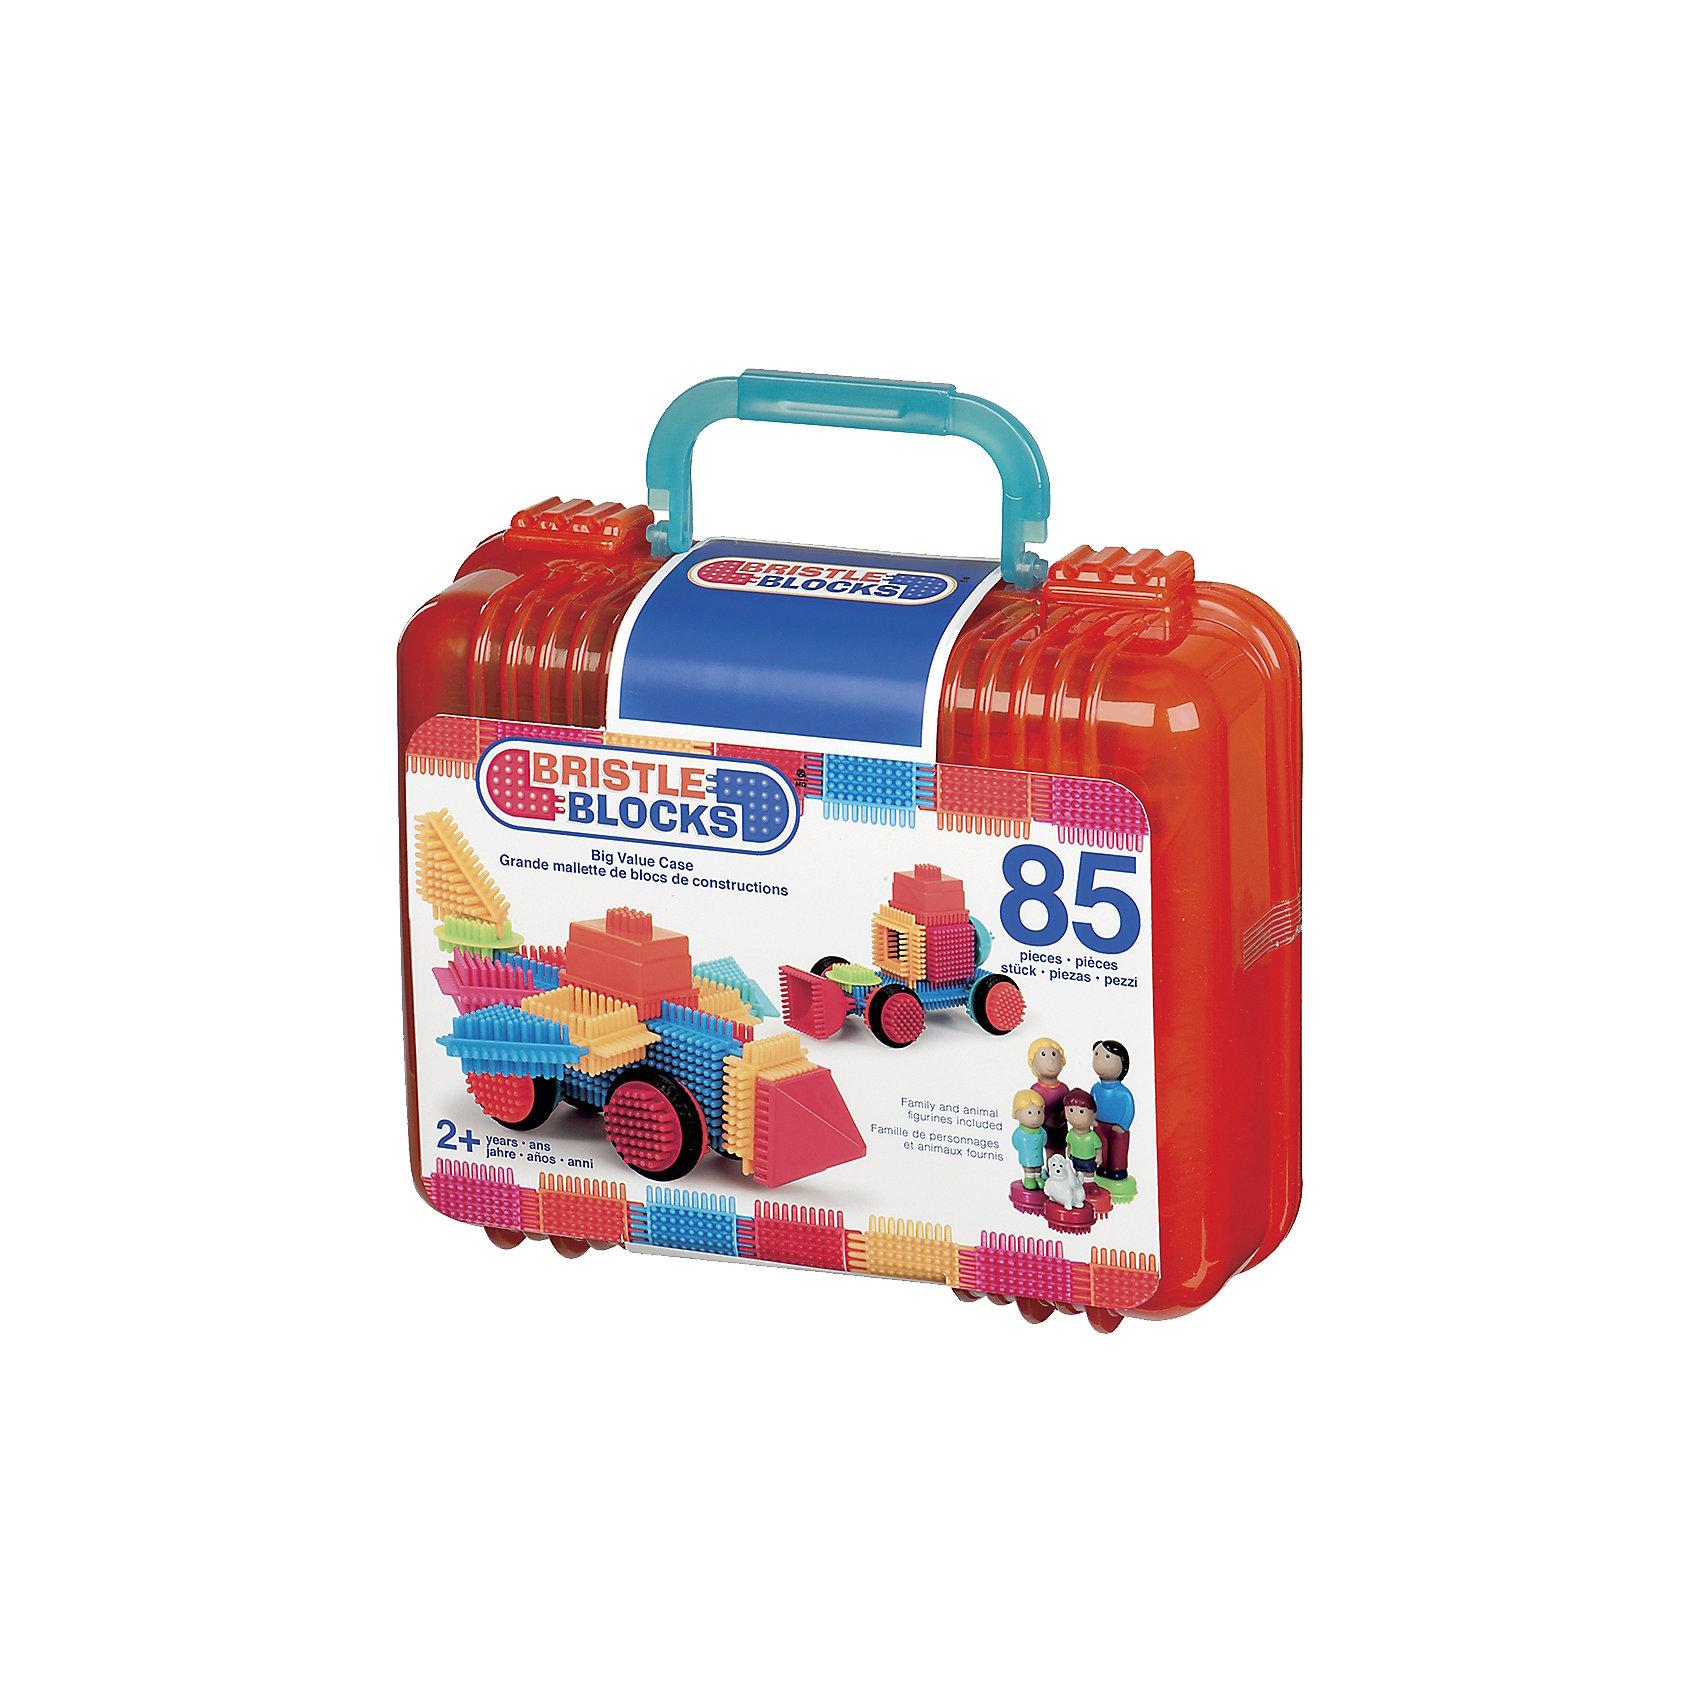 ����������� ���������� � �����������, 85 �������, Bristle Blocks (-)